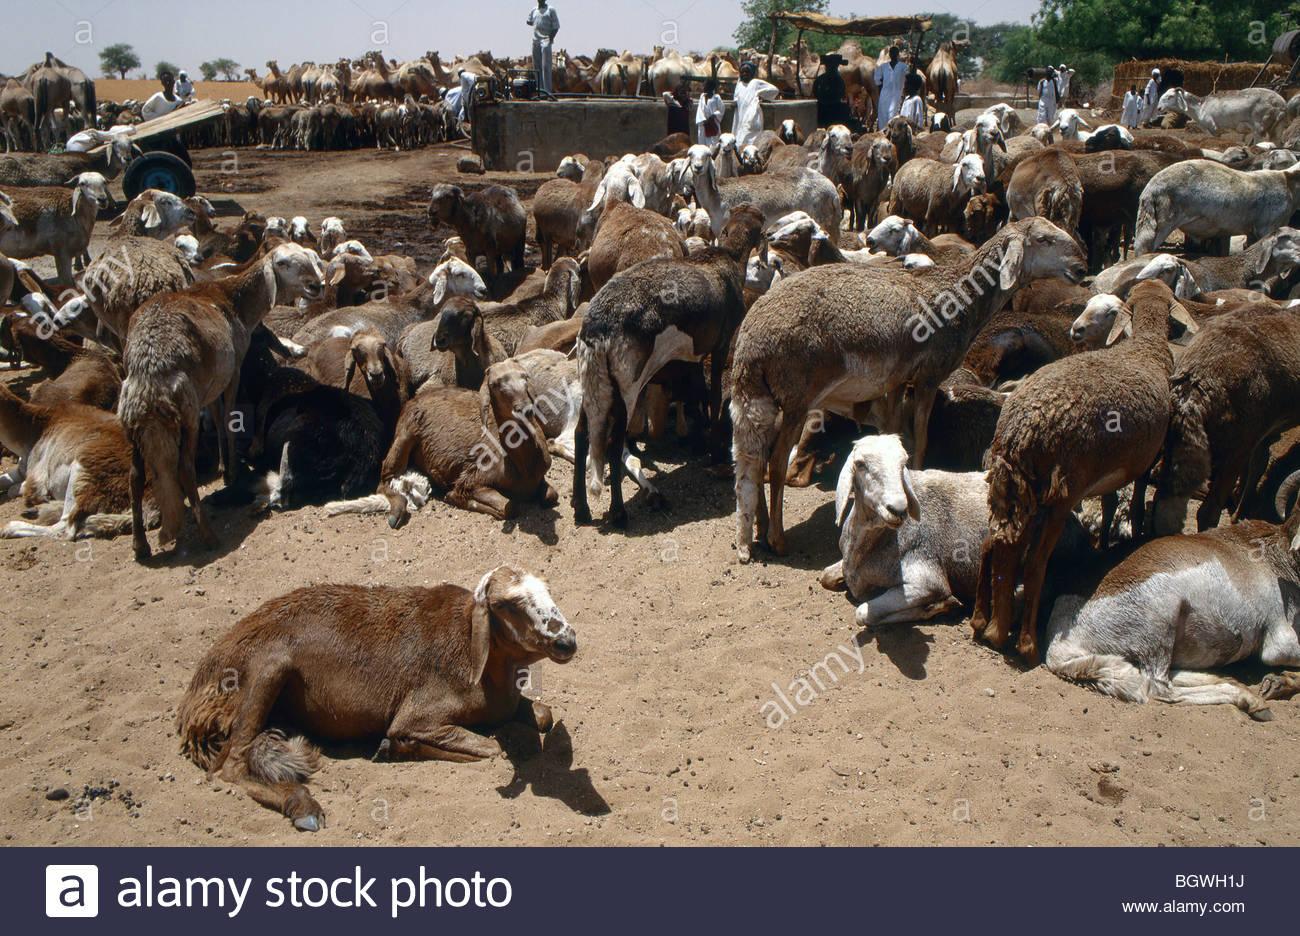 Sudan Live Sheep